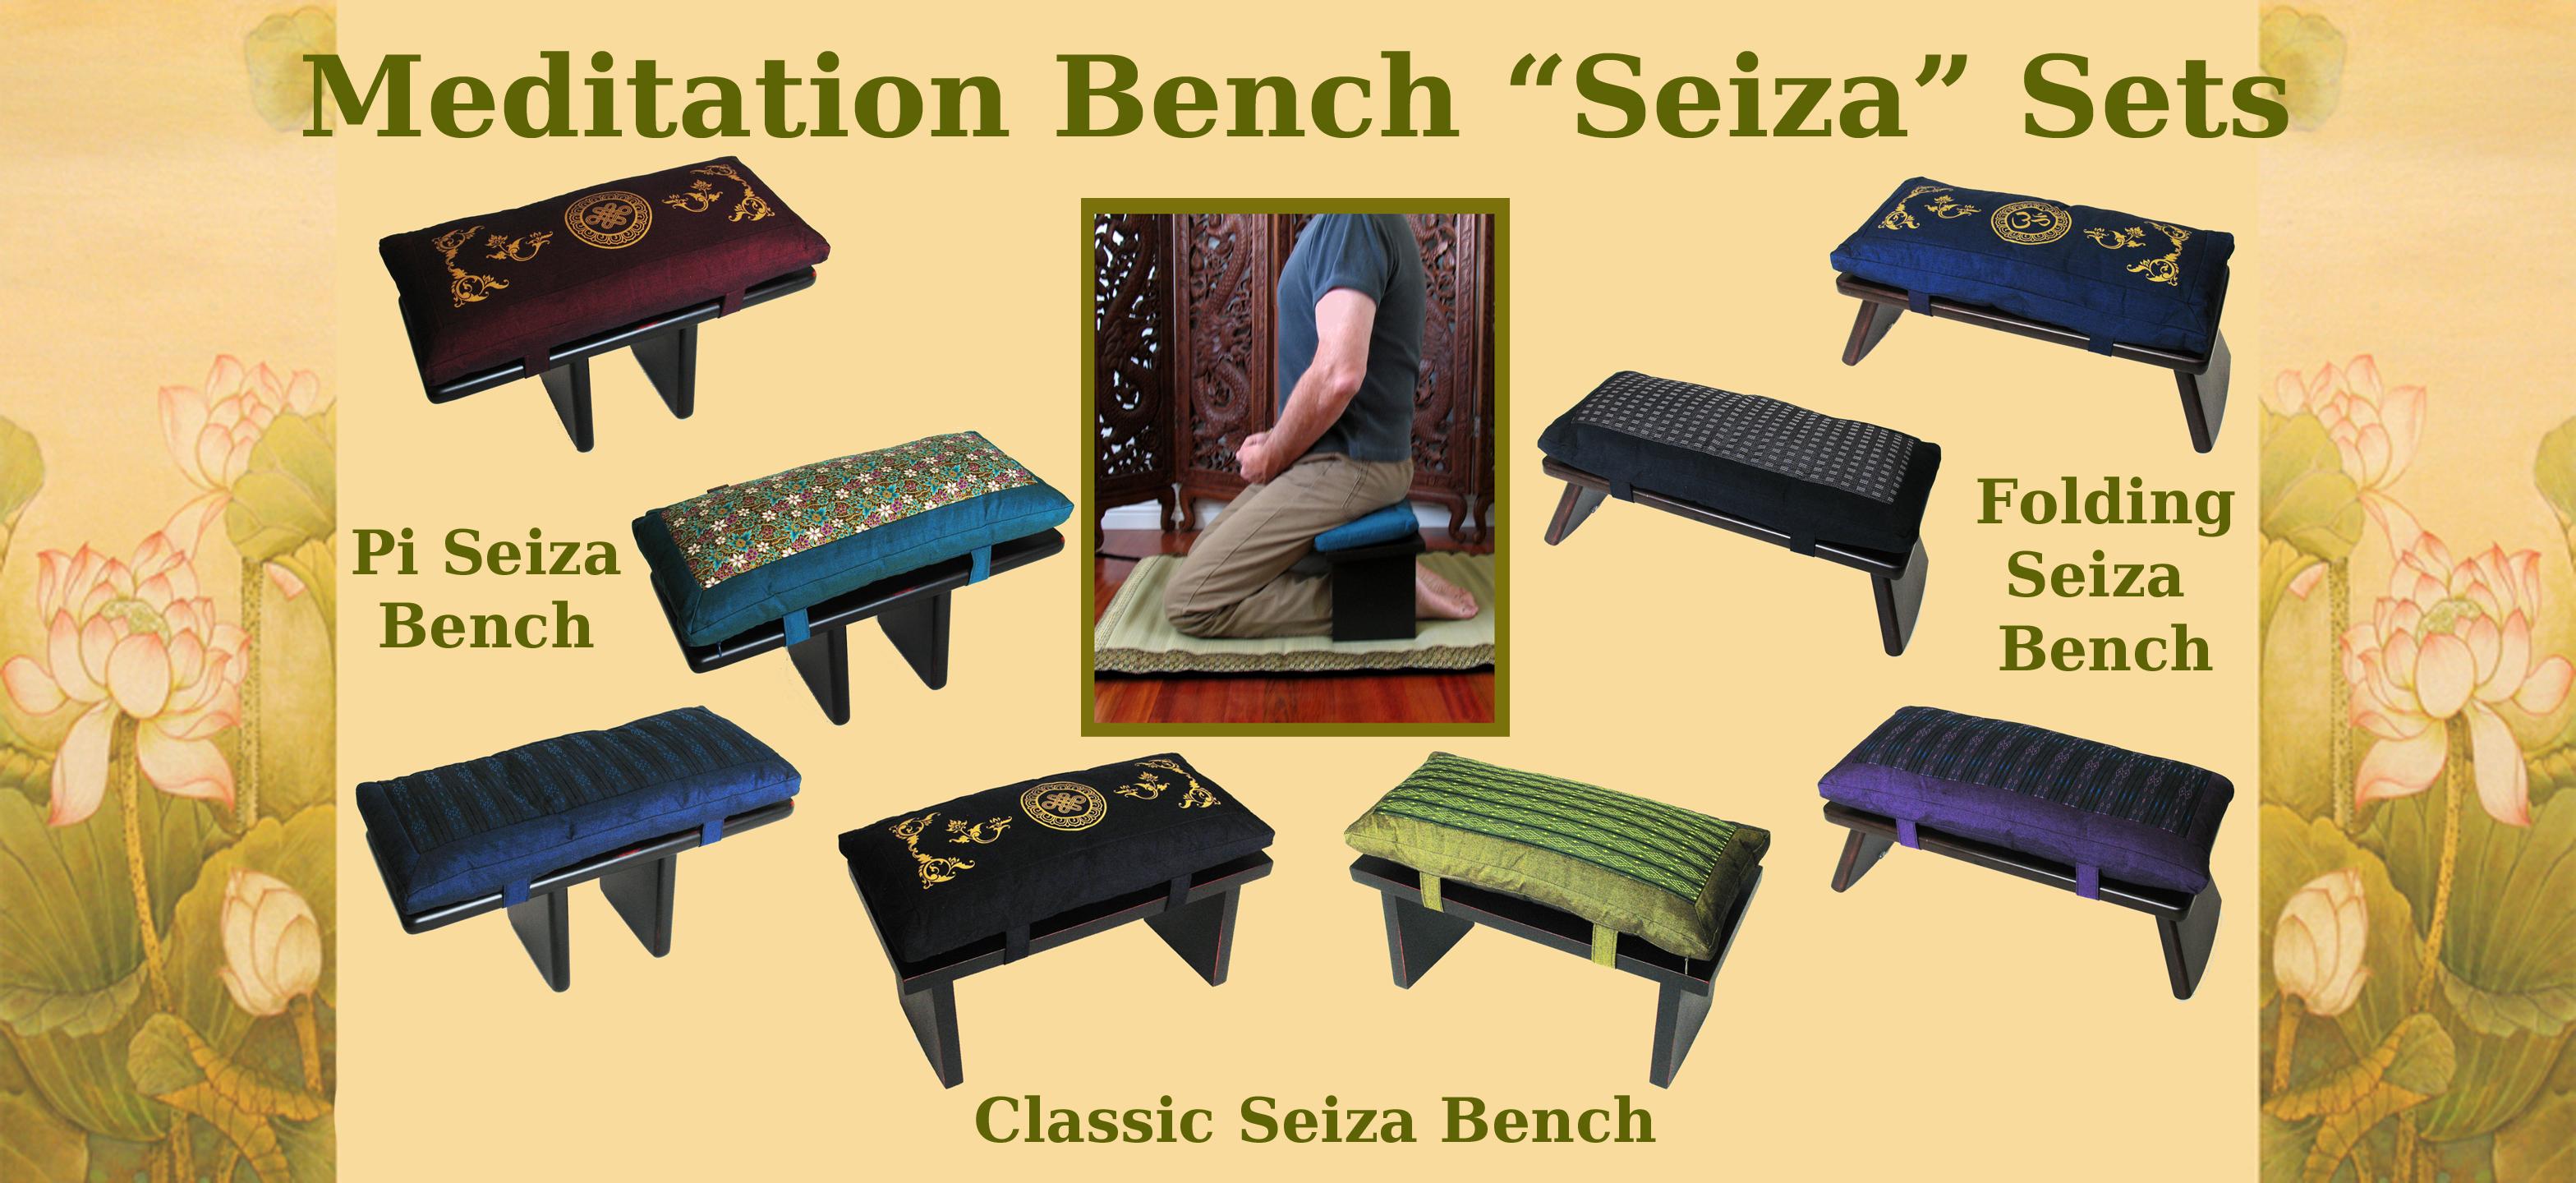 seiza-sets-2.jpg